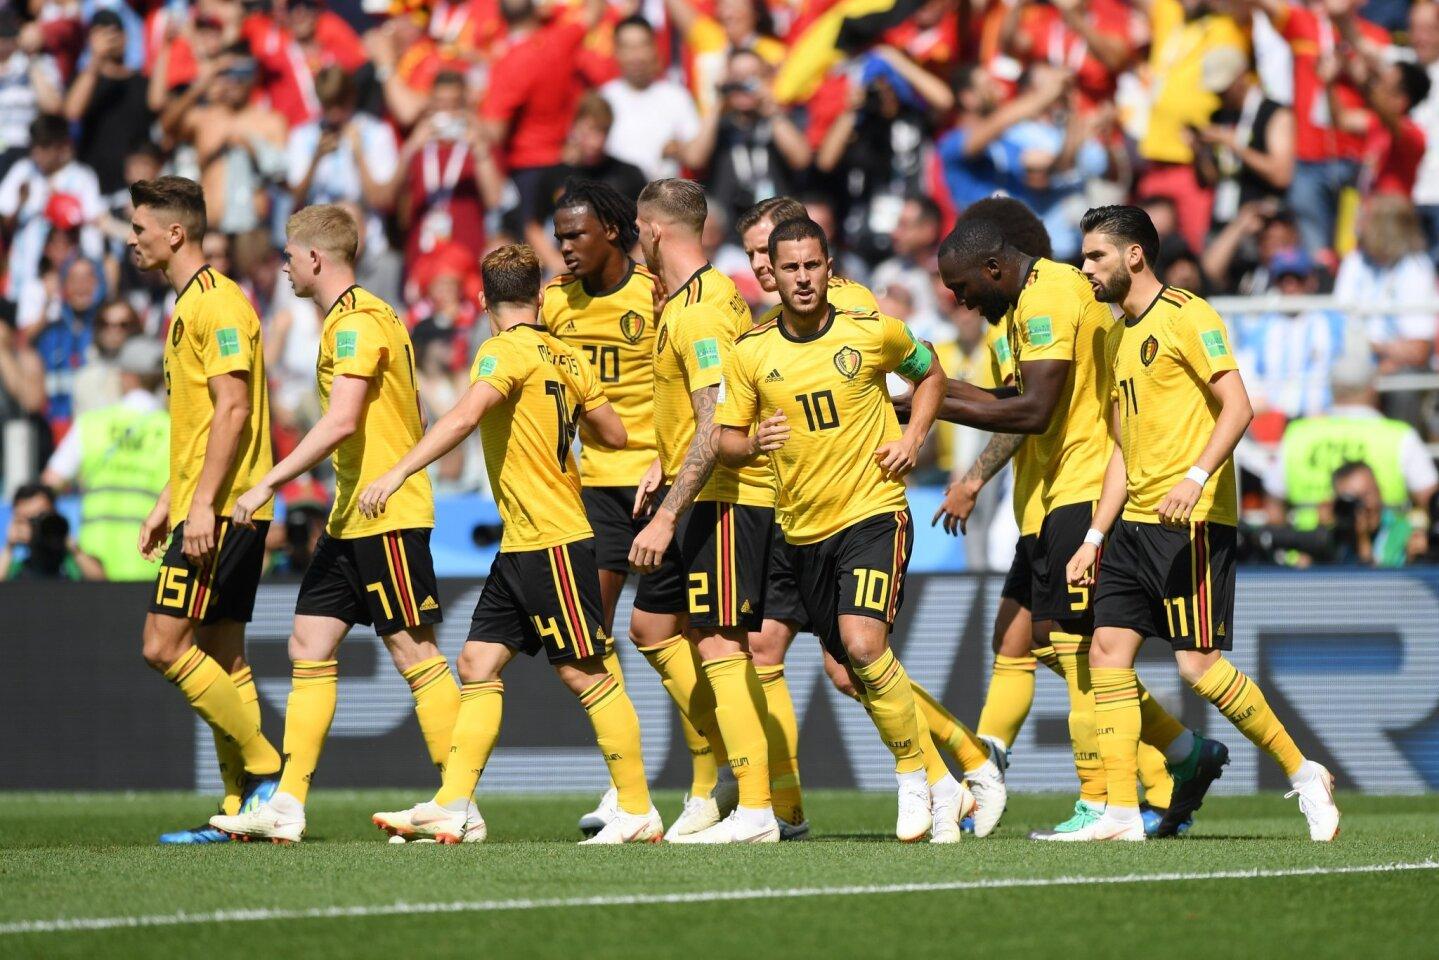 Bélgica 5-2 Túnez